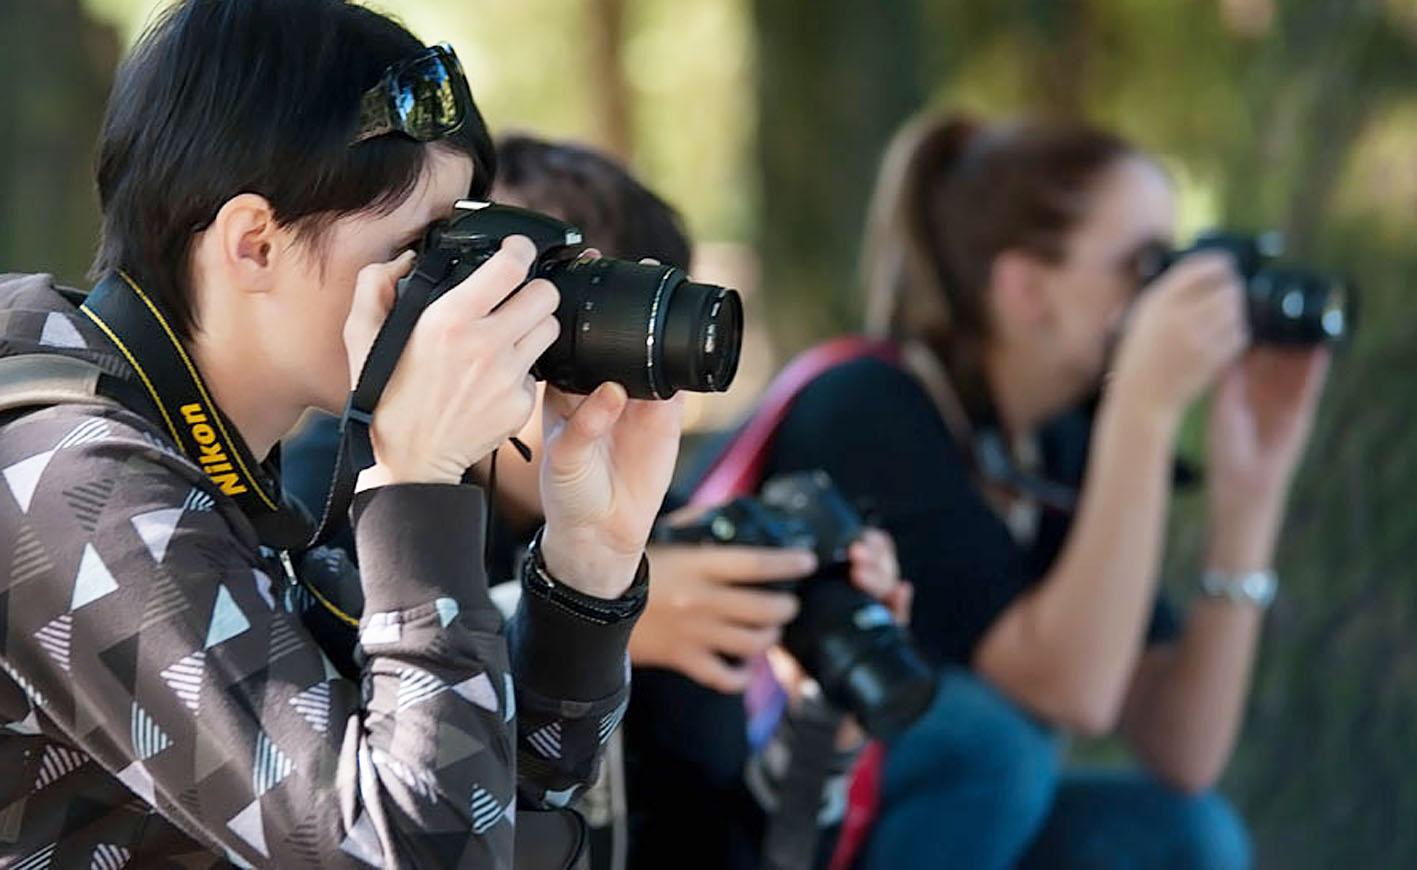 GRUPNI FOTO TEČAJ OSNOVE FOTOGRAFIJE